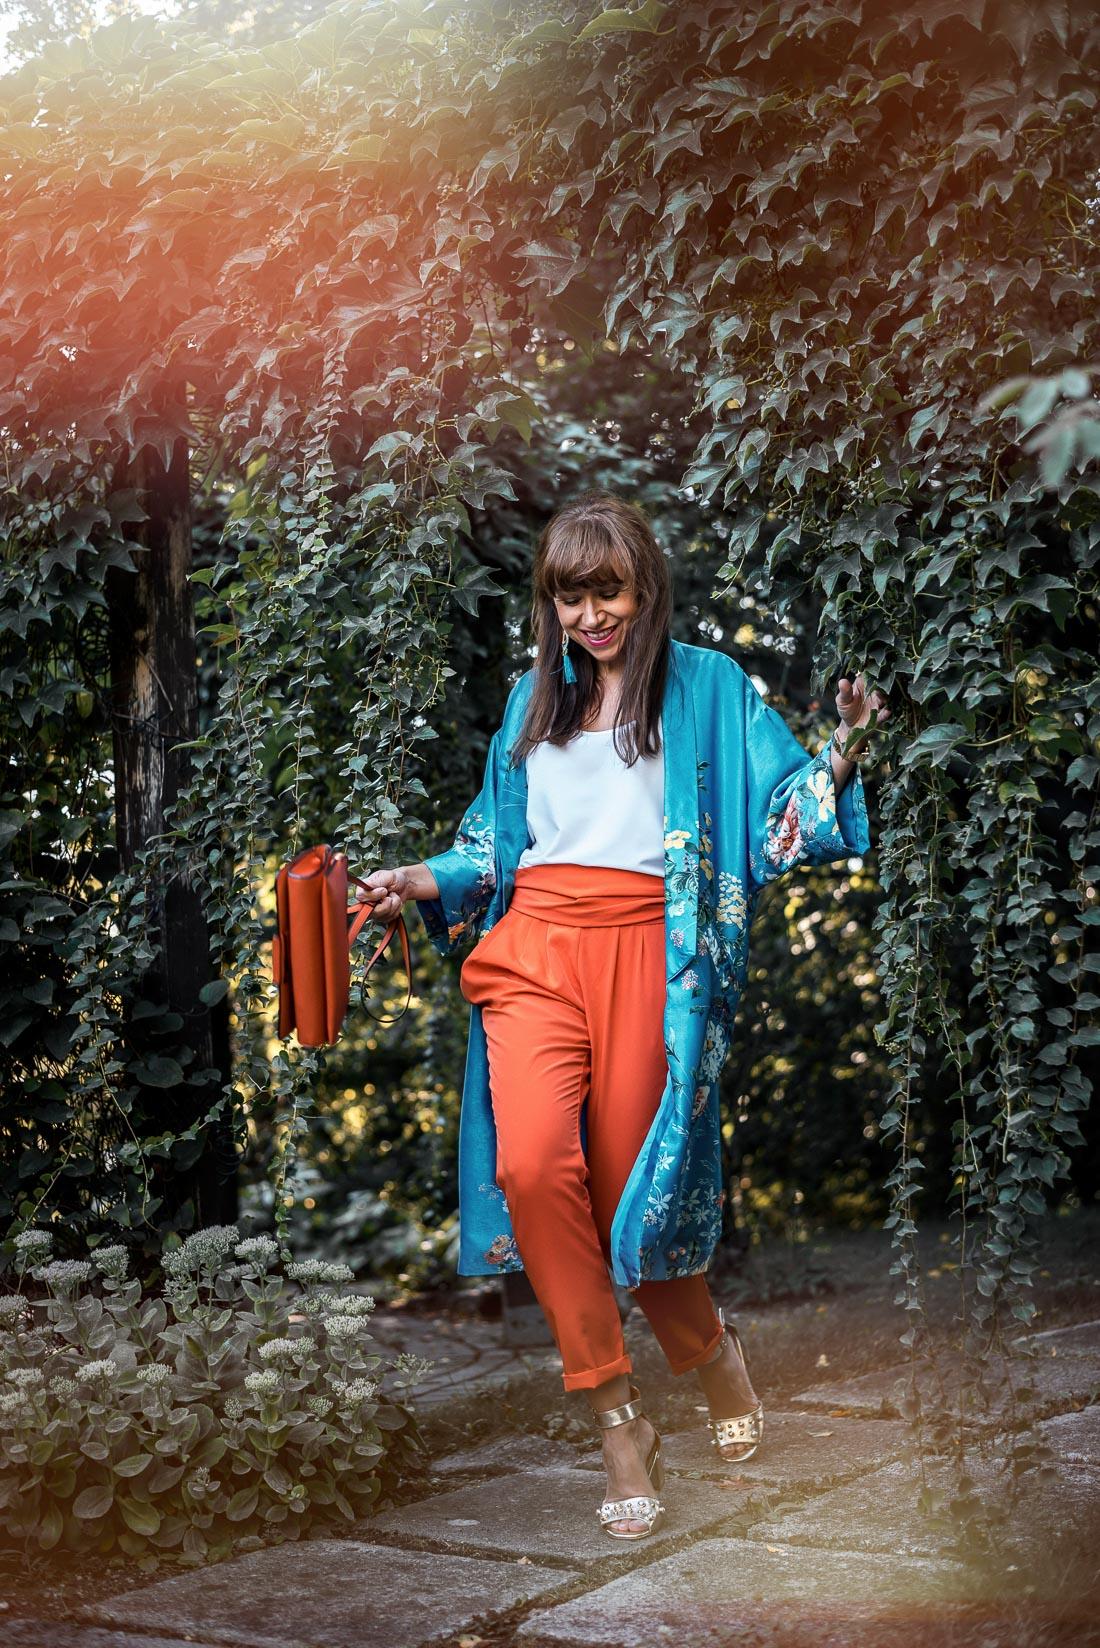 NOVÝ BYT, NOVÉ MOŽNOSTI_Katharine-fashion is beautiful_blog 2_Náušnice Bazu_Kvetinové kimono ZARA_Katarína Jakubčová_fashion blogerka